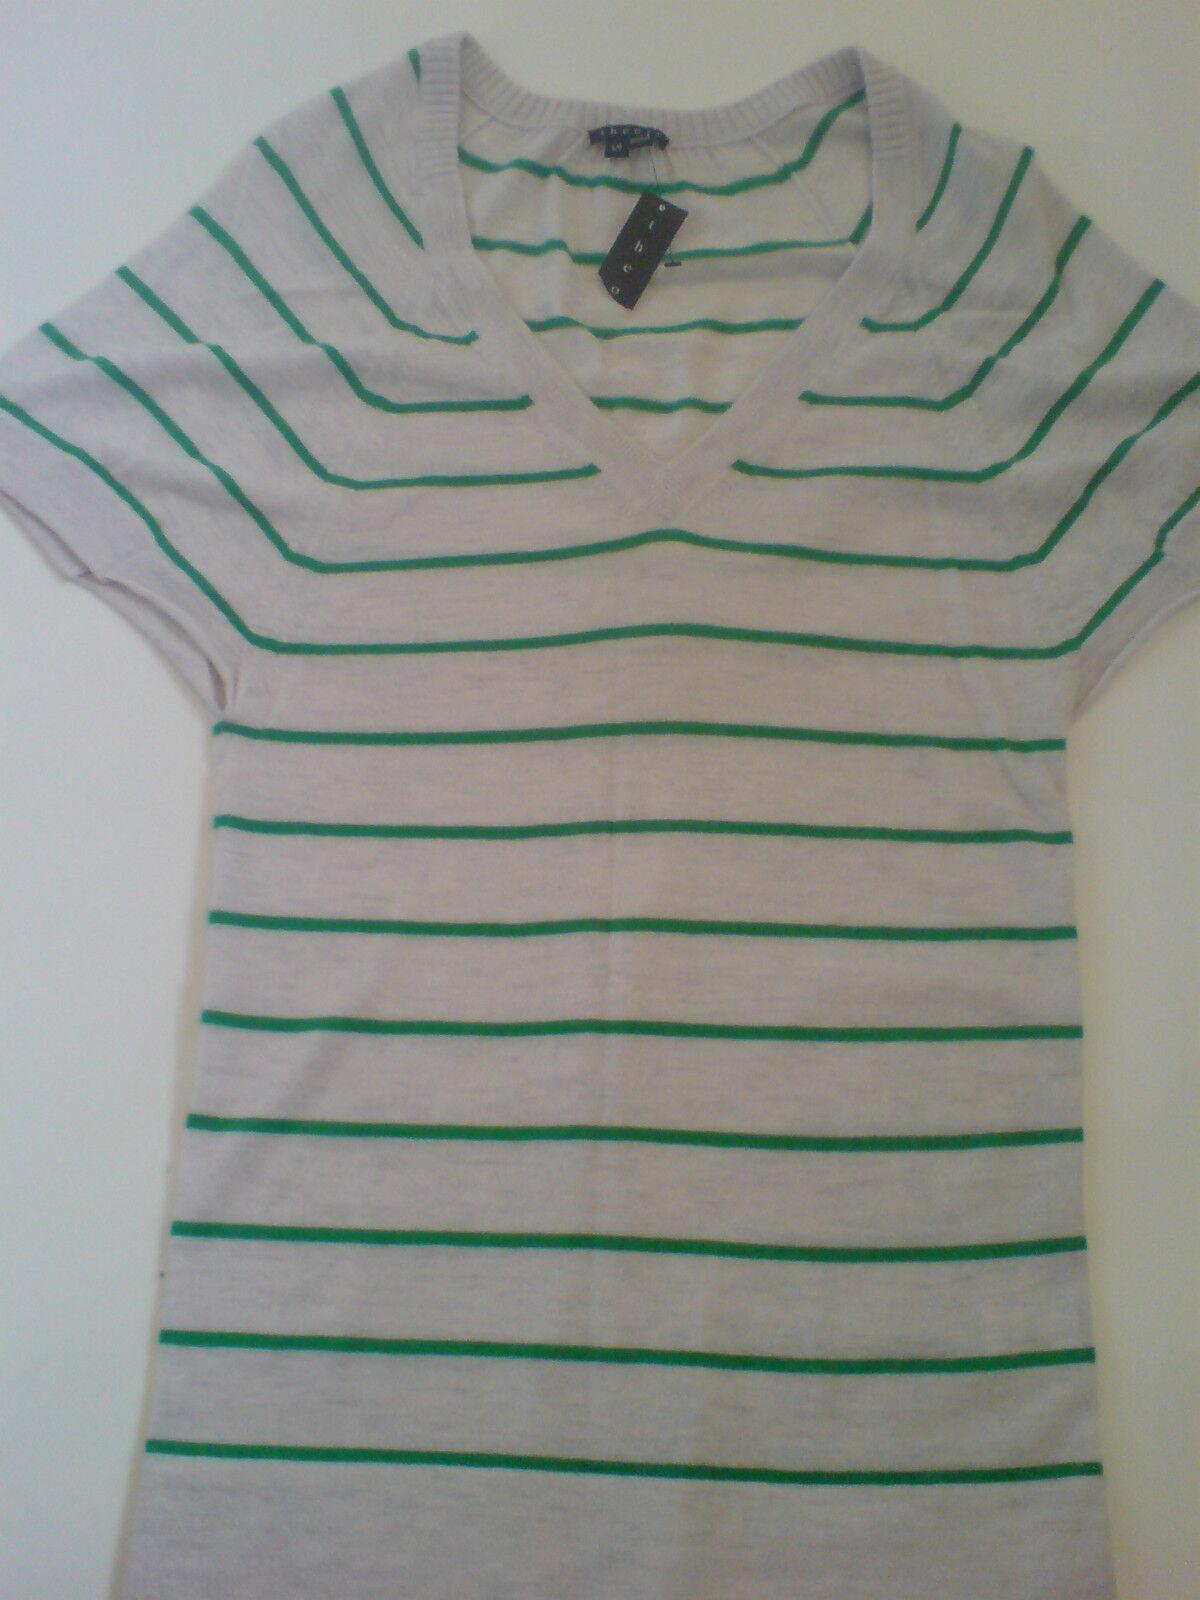 BNWT Theory 100% Cashmere 'Annie' Grey Green Stripe Short Sleeve Jumper